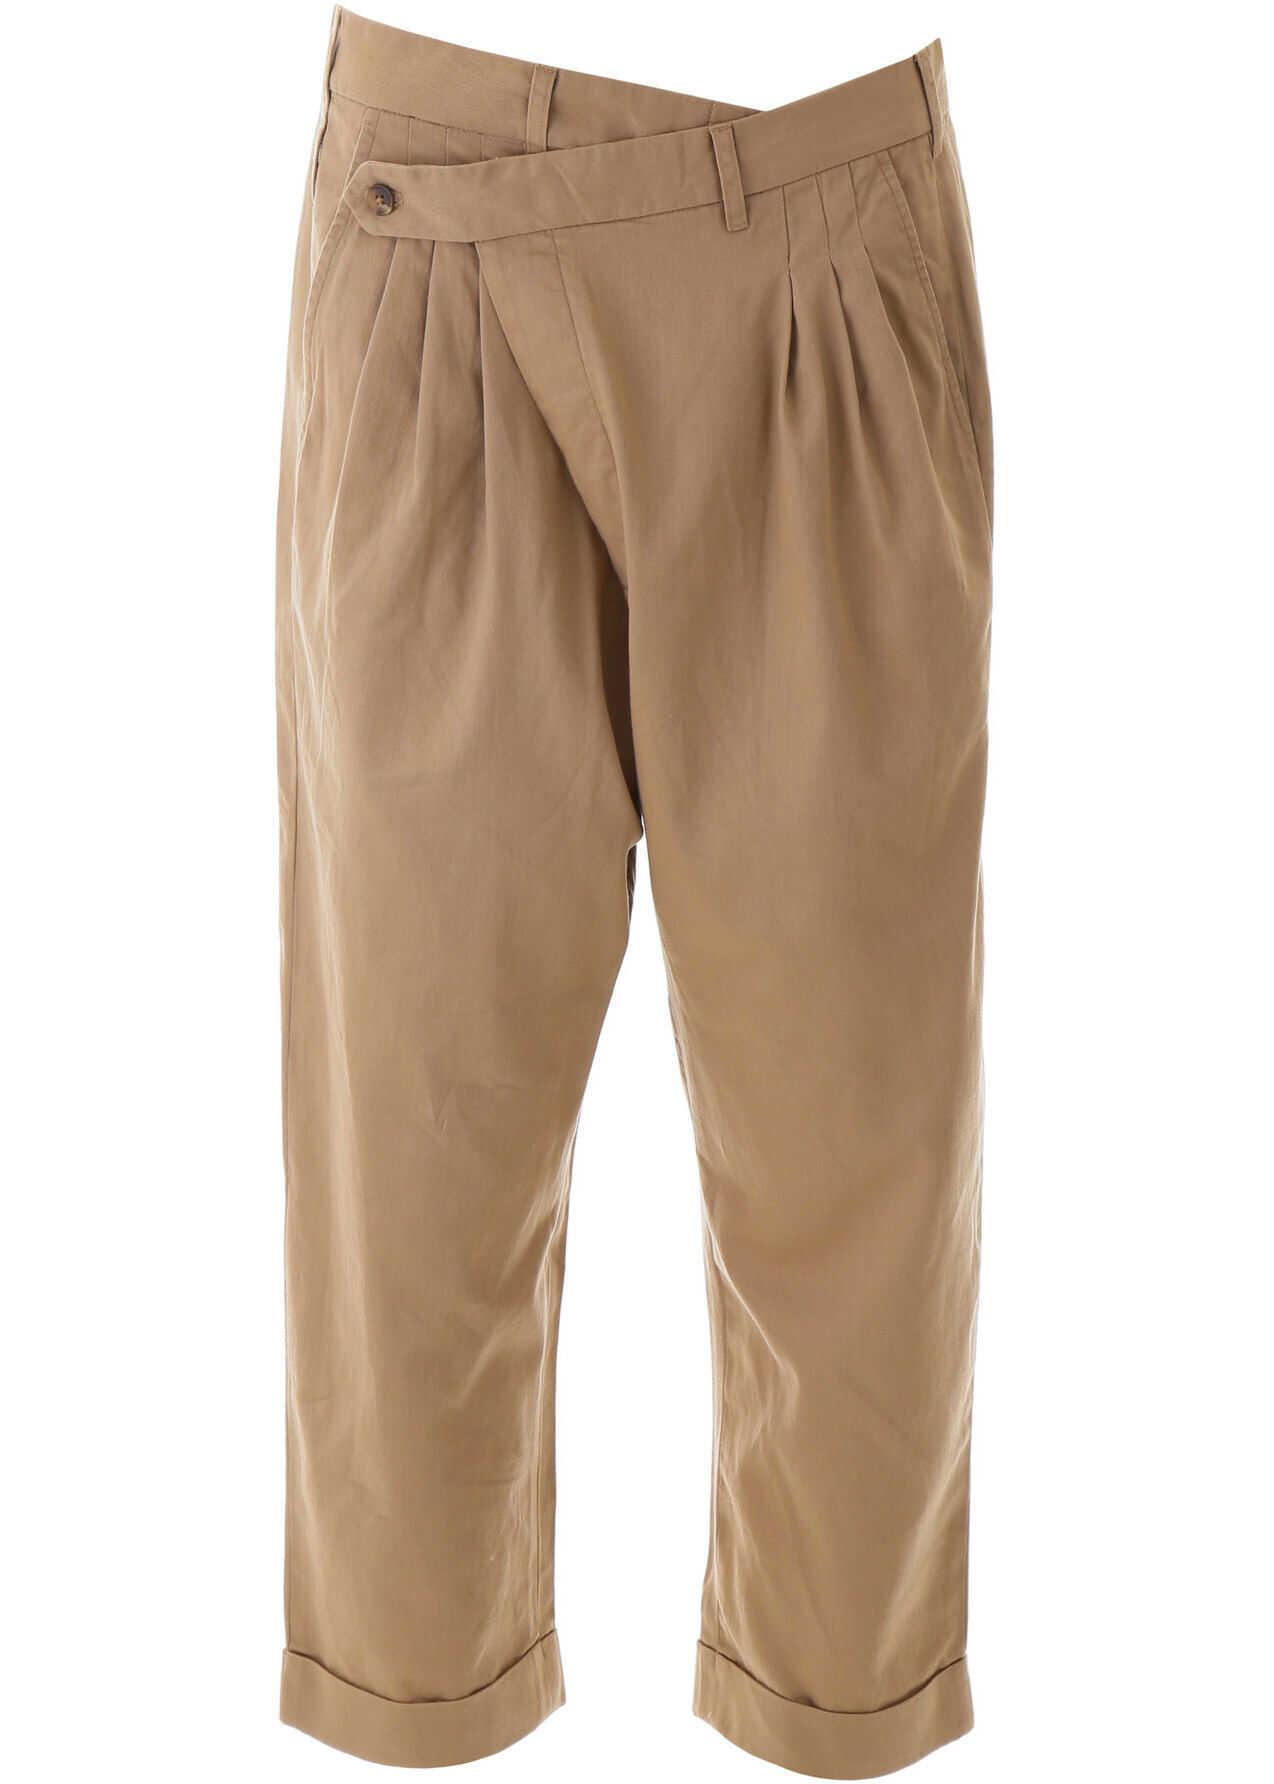 R13 Chino Trousers KHAKI